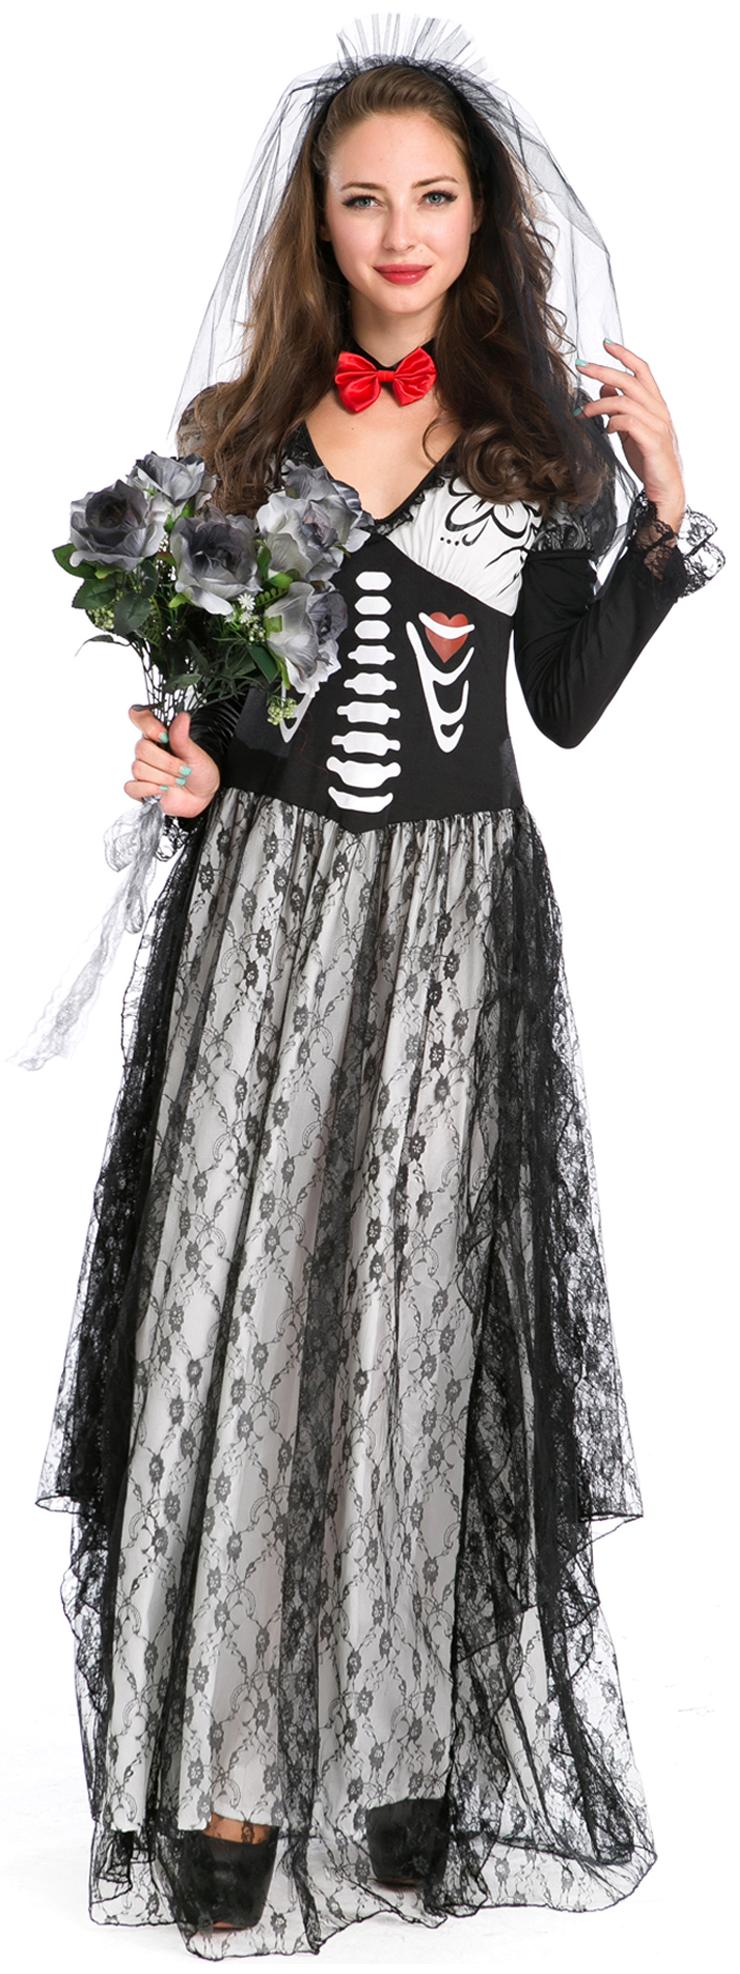 Day of the Dead Boneyard Bride Costume, Deluxe Skeleton Bride Costume, Bone Yard Ghost Bride Costume, #N9124